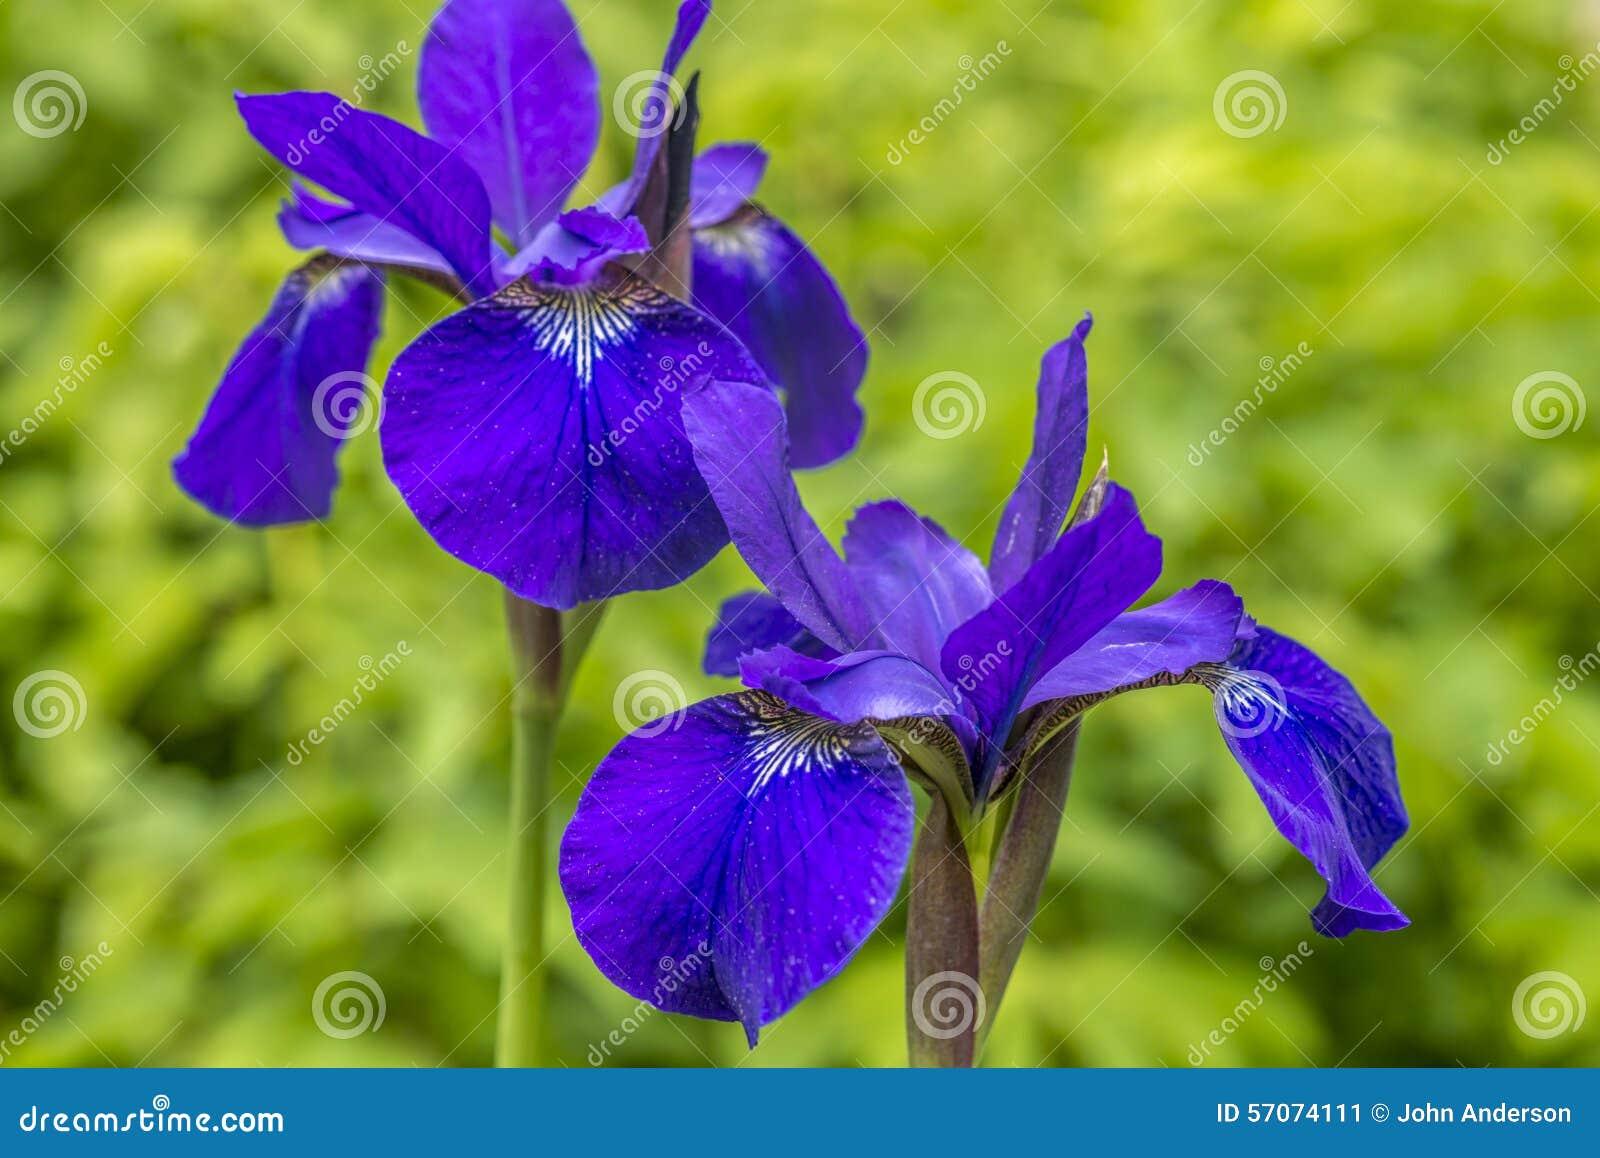 Irisversicolo of purpere iris